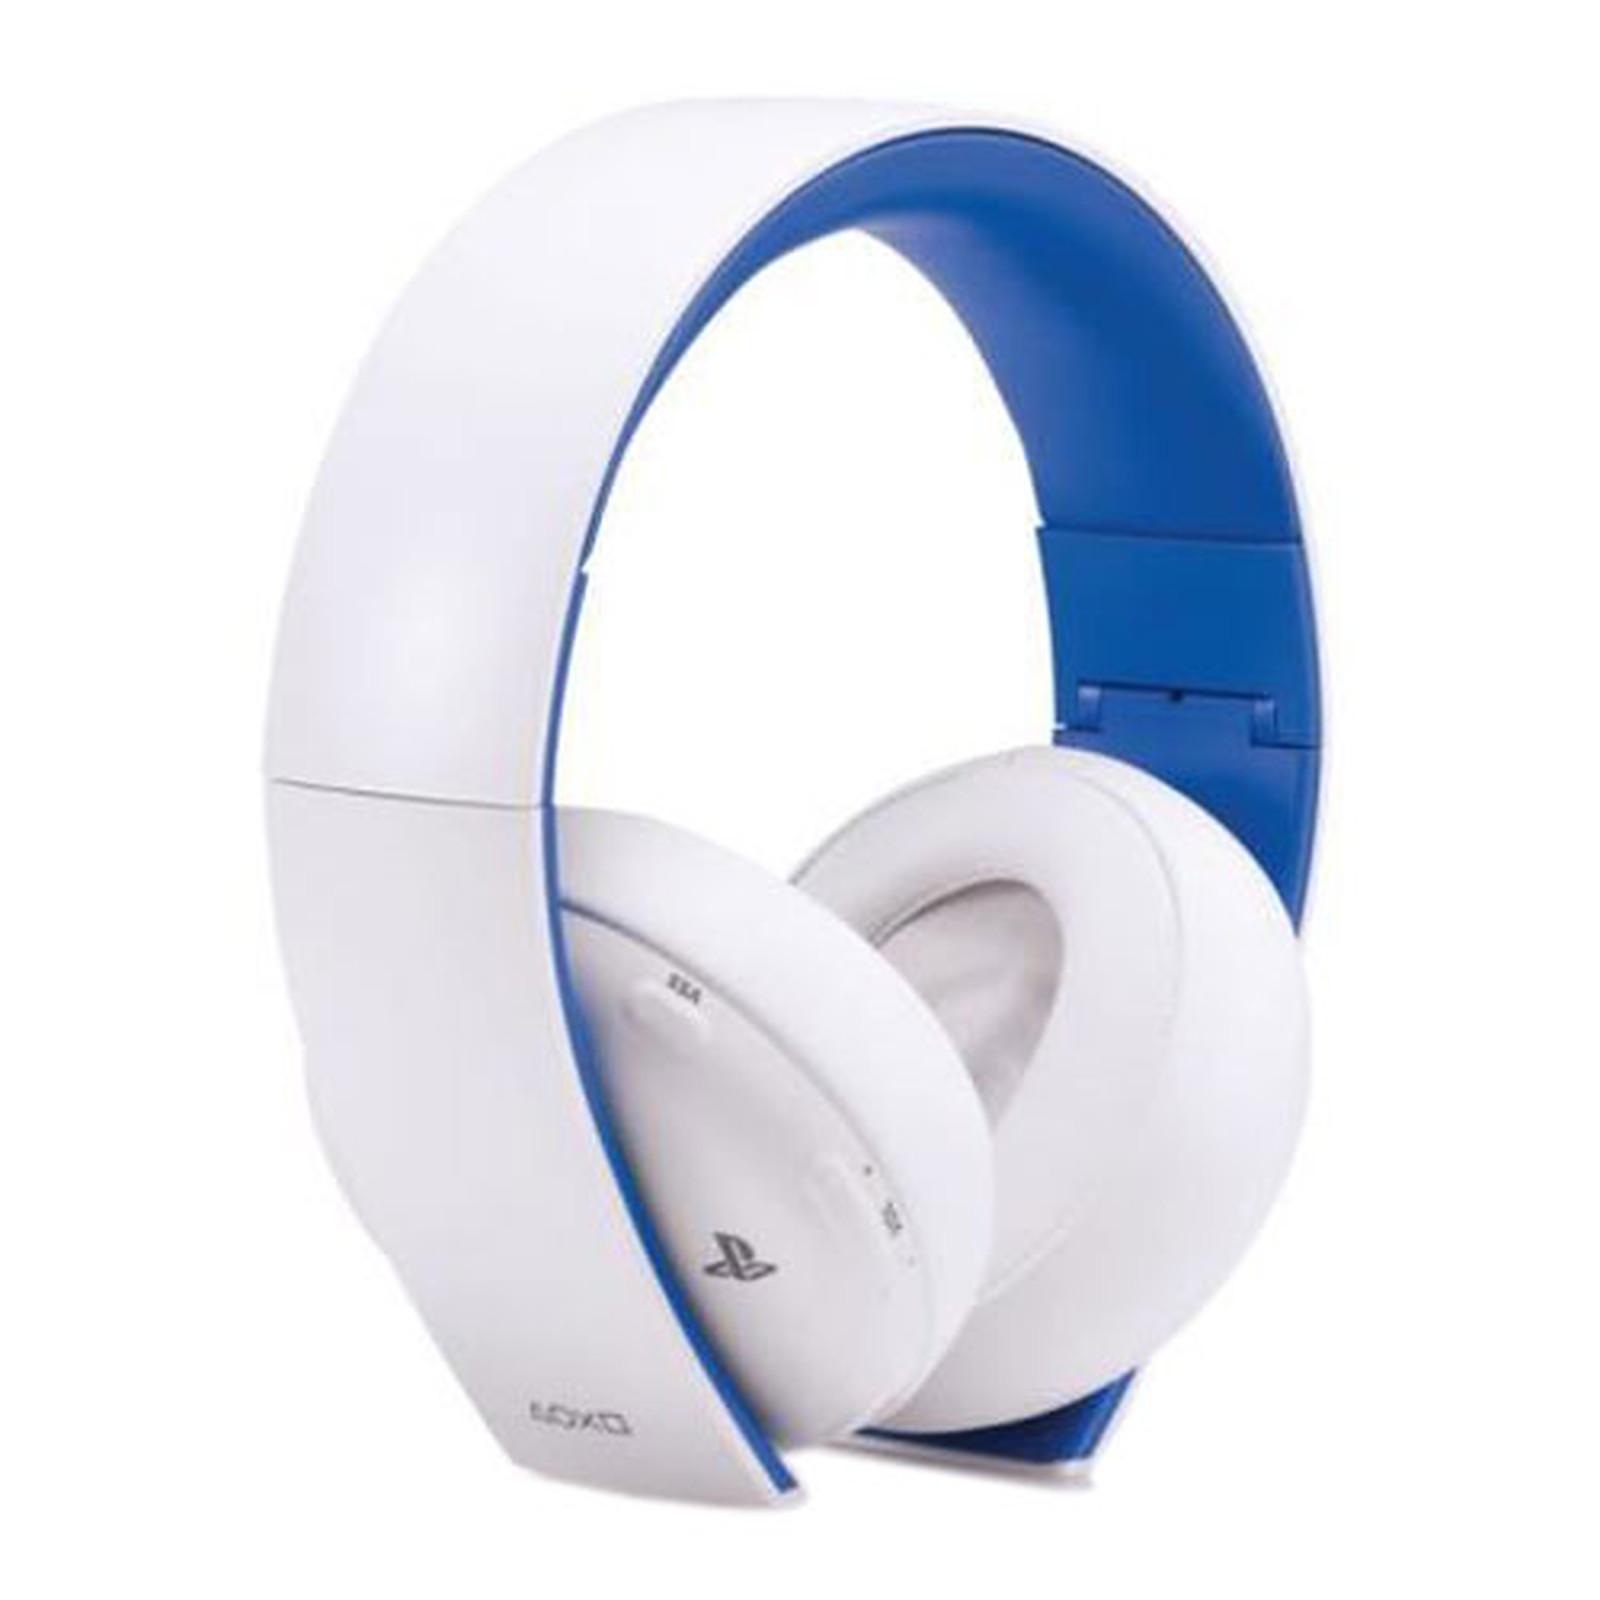 casque sony sans fil stéréo 2.0 ps4 ps3 psvita